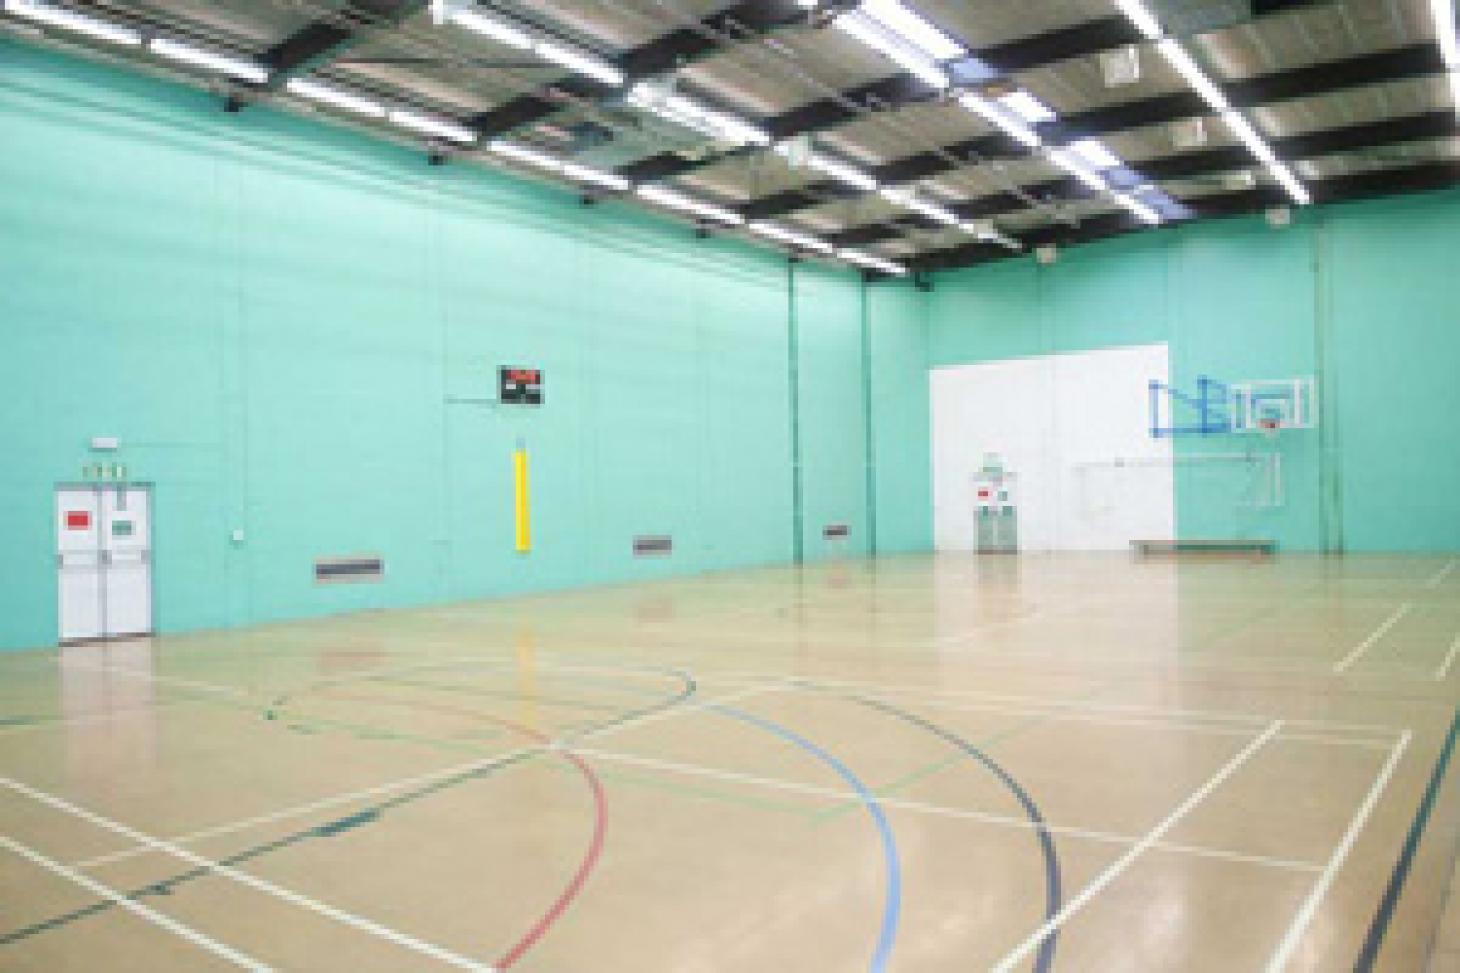 Robert Lowe Sports Centre Indoor netball court